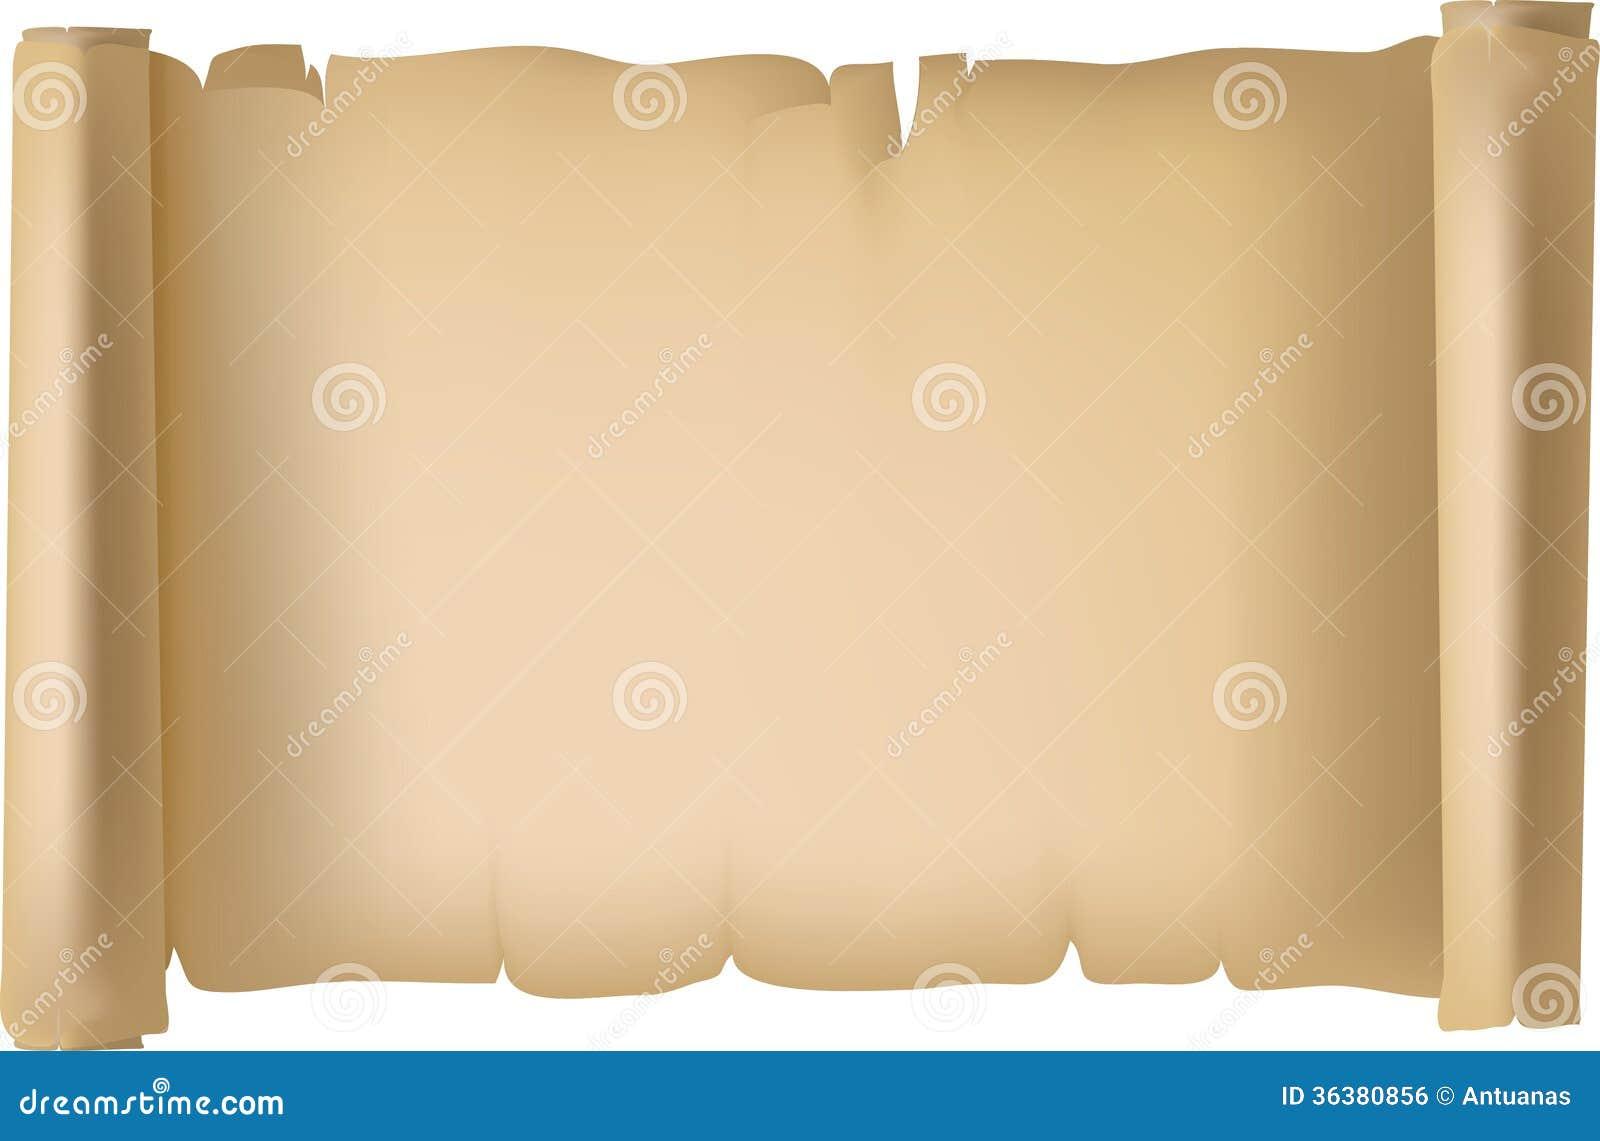 Carta Di Pergament Fotografia Stock Immagine Di Storia 36380856